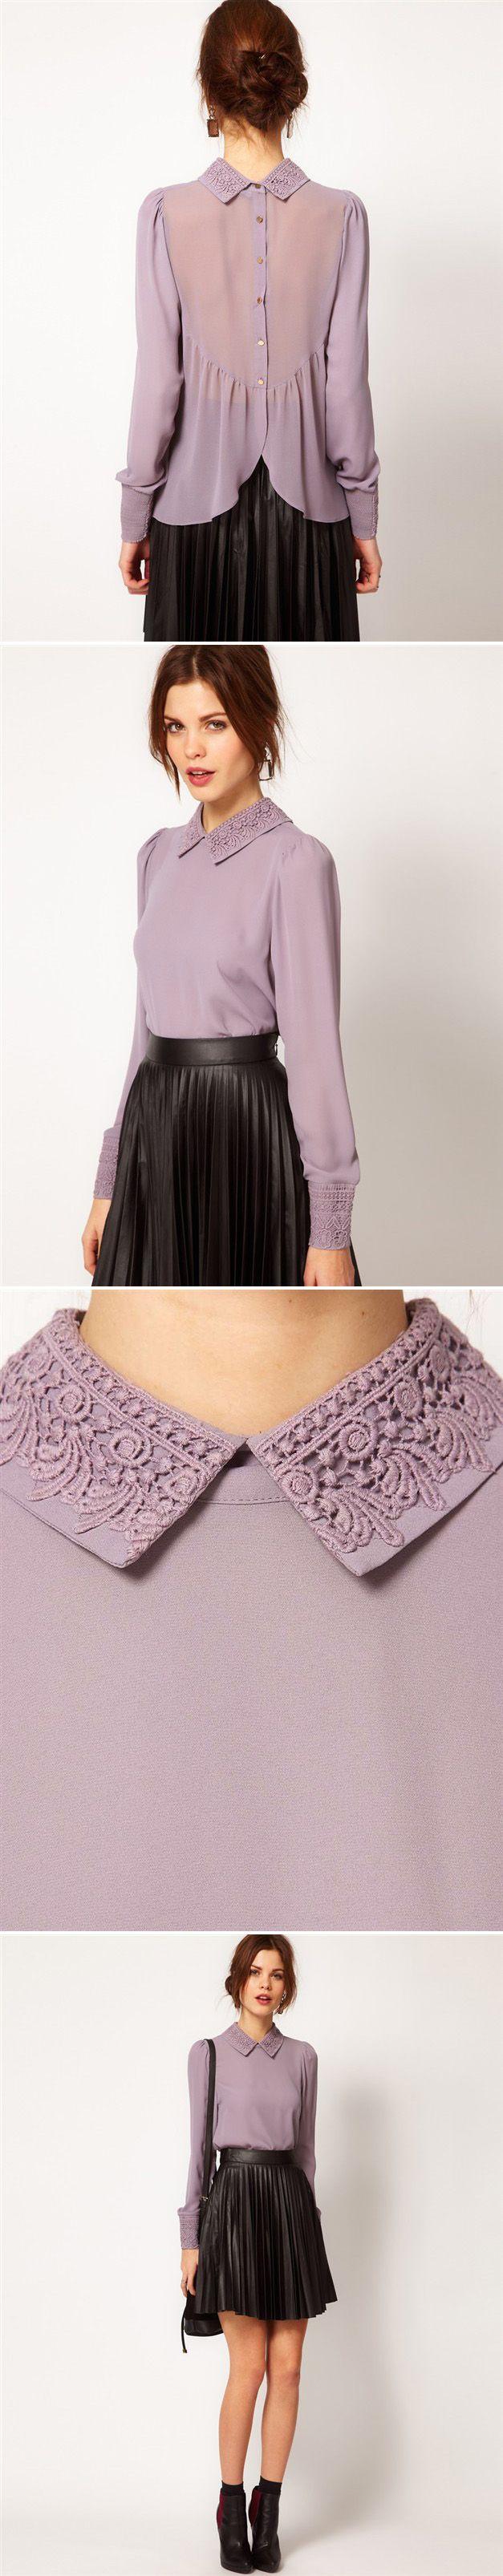 Temperament Chiffon Purple Shirt